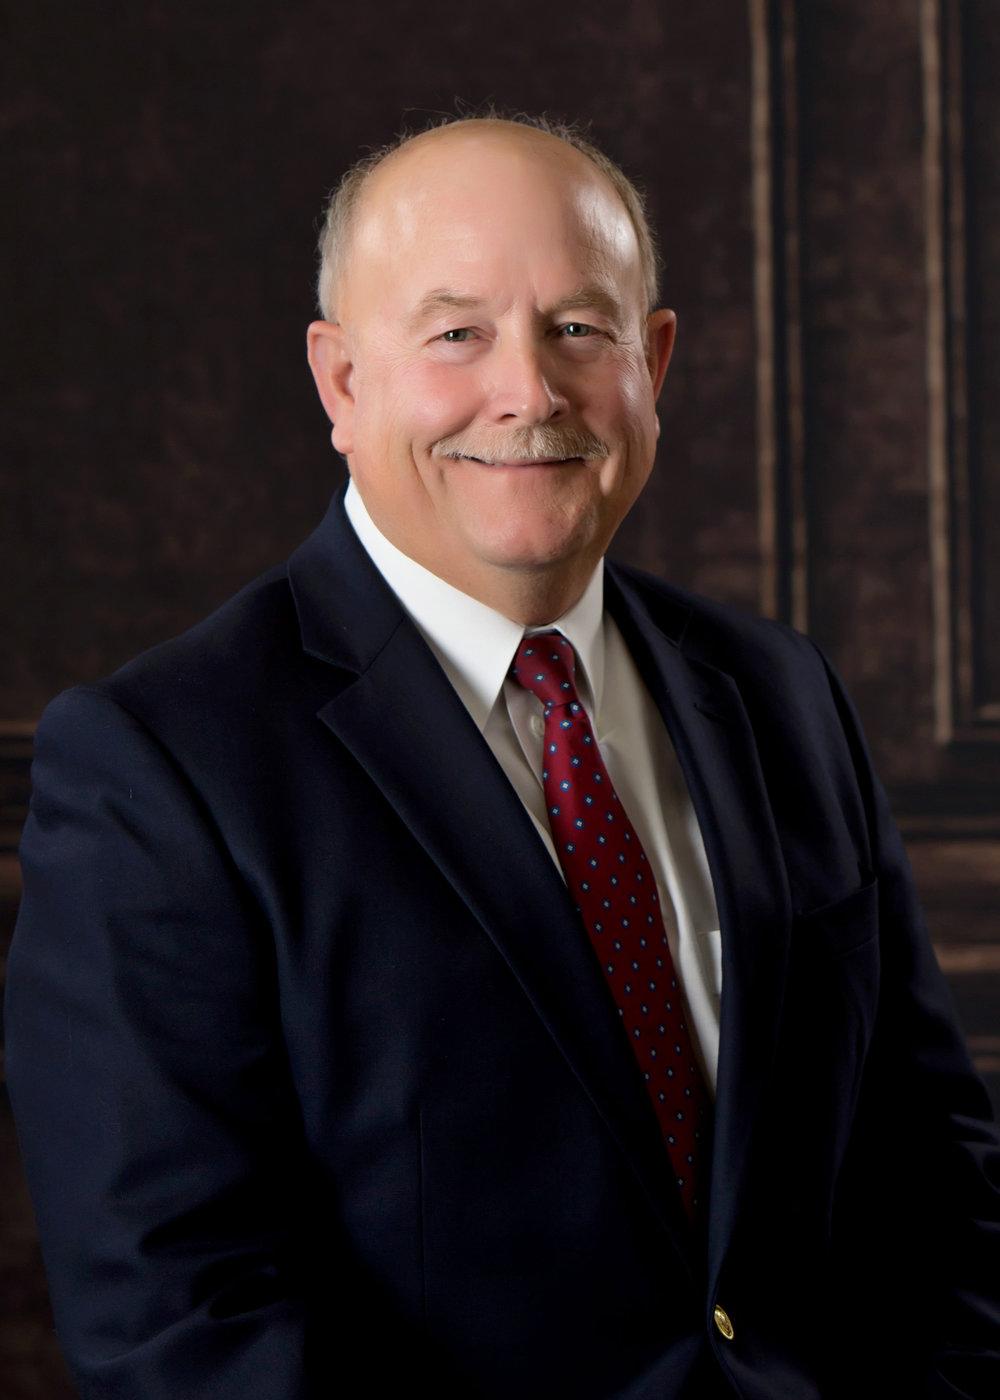 David Summers, Attorney